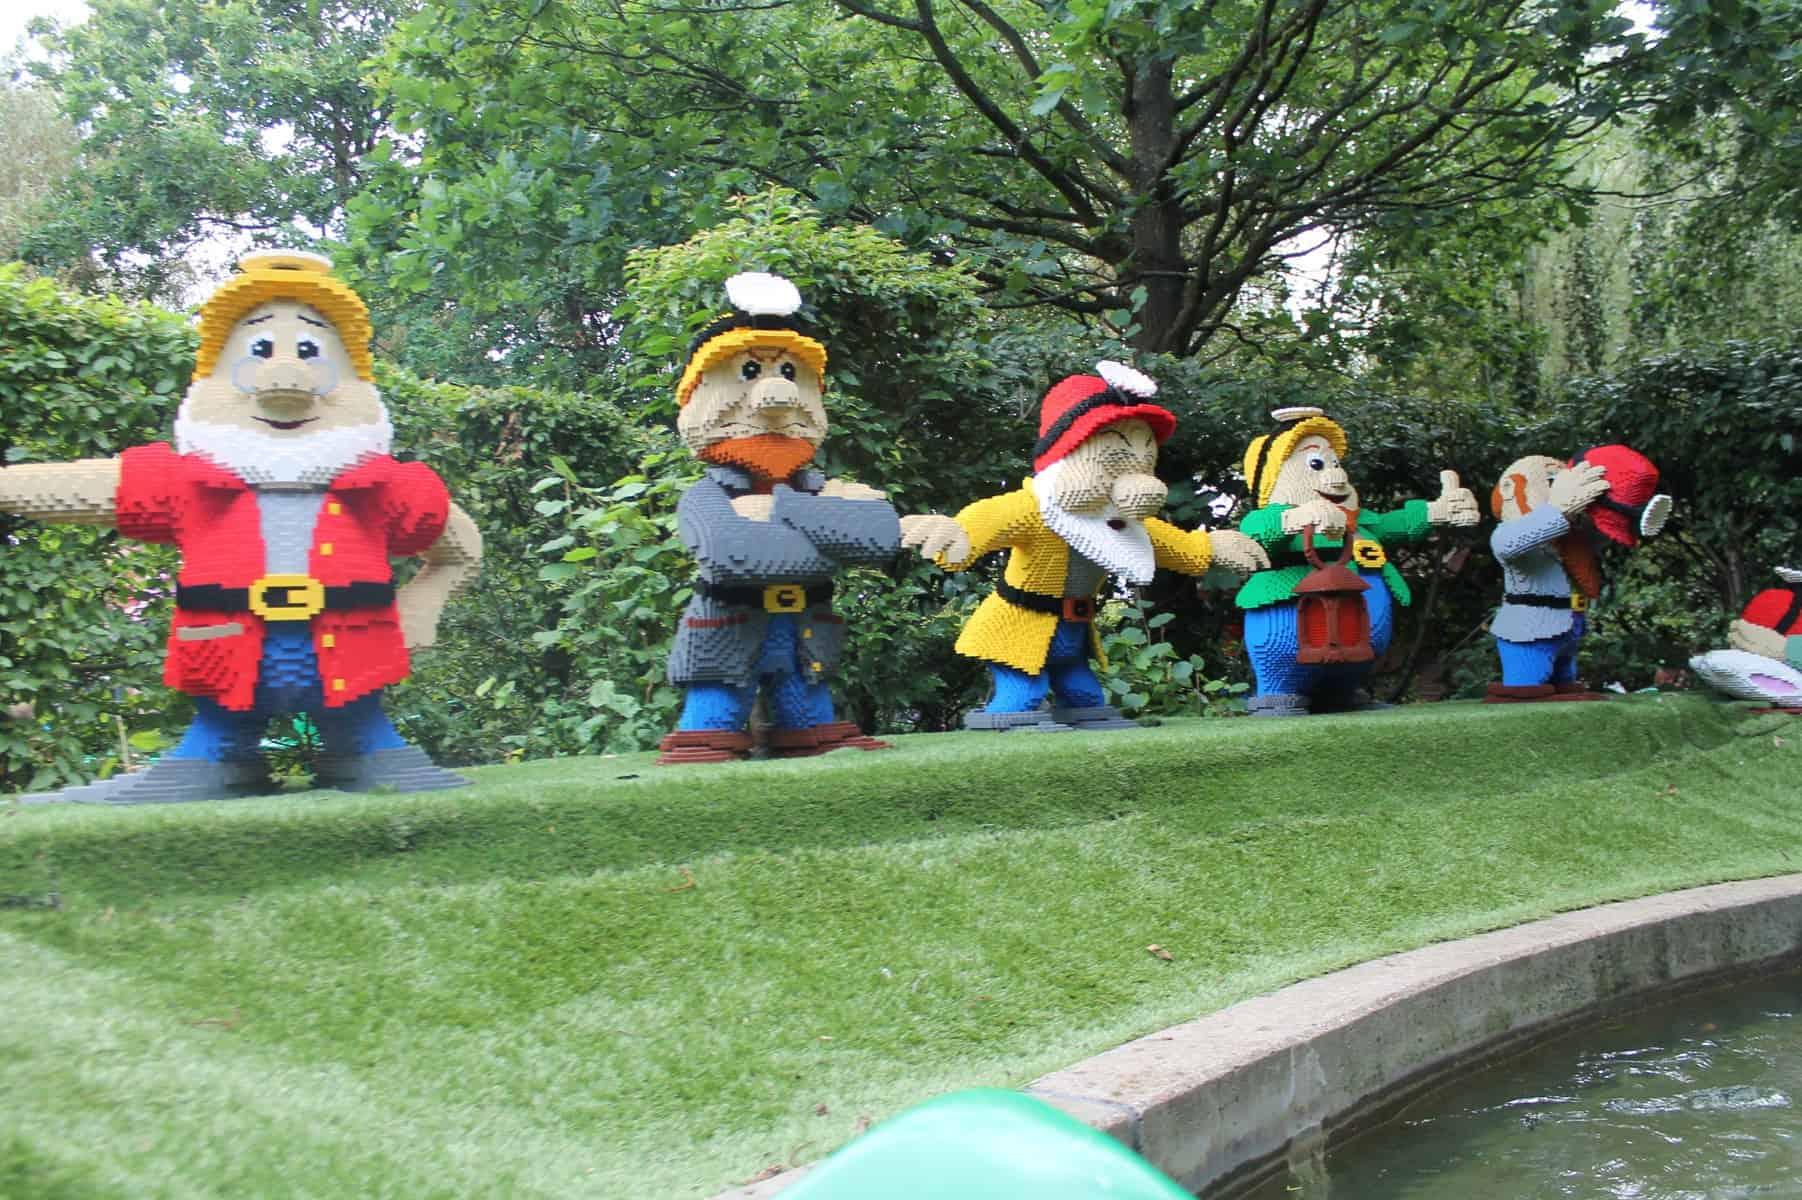 Review: Legoland Windsor